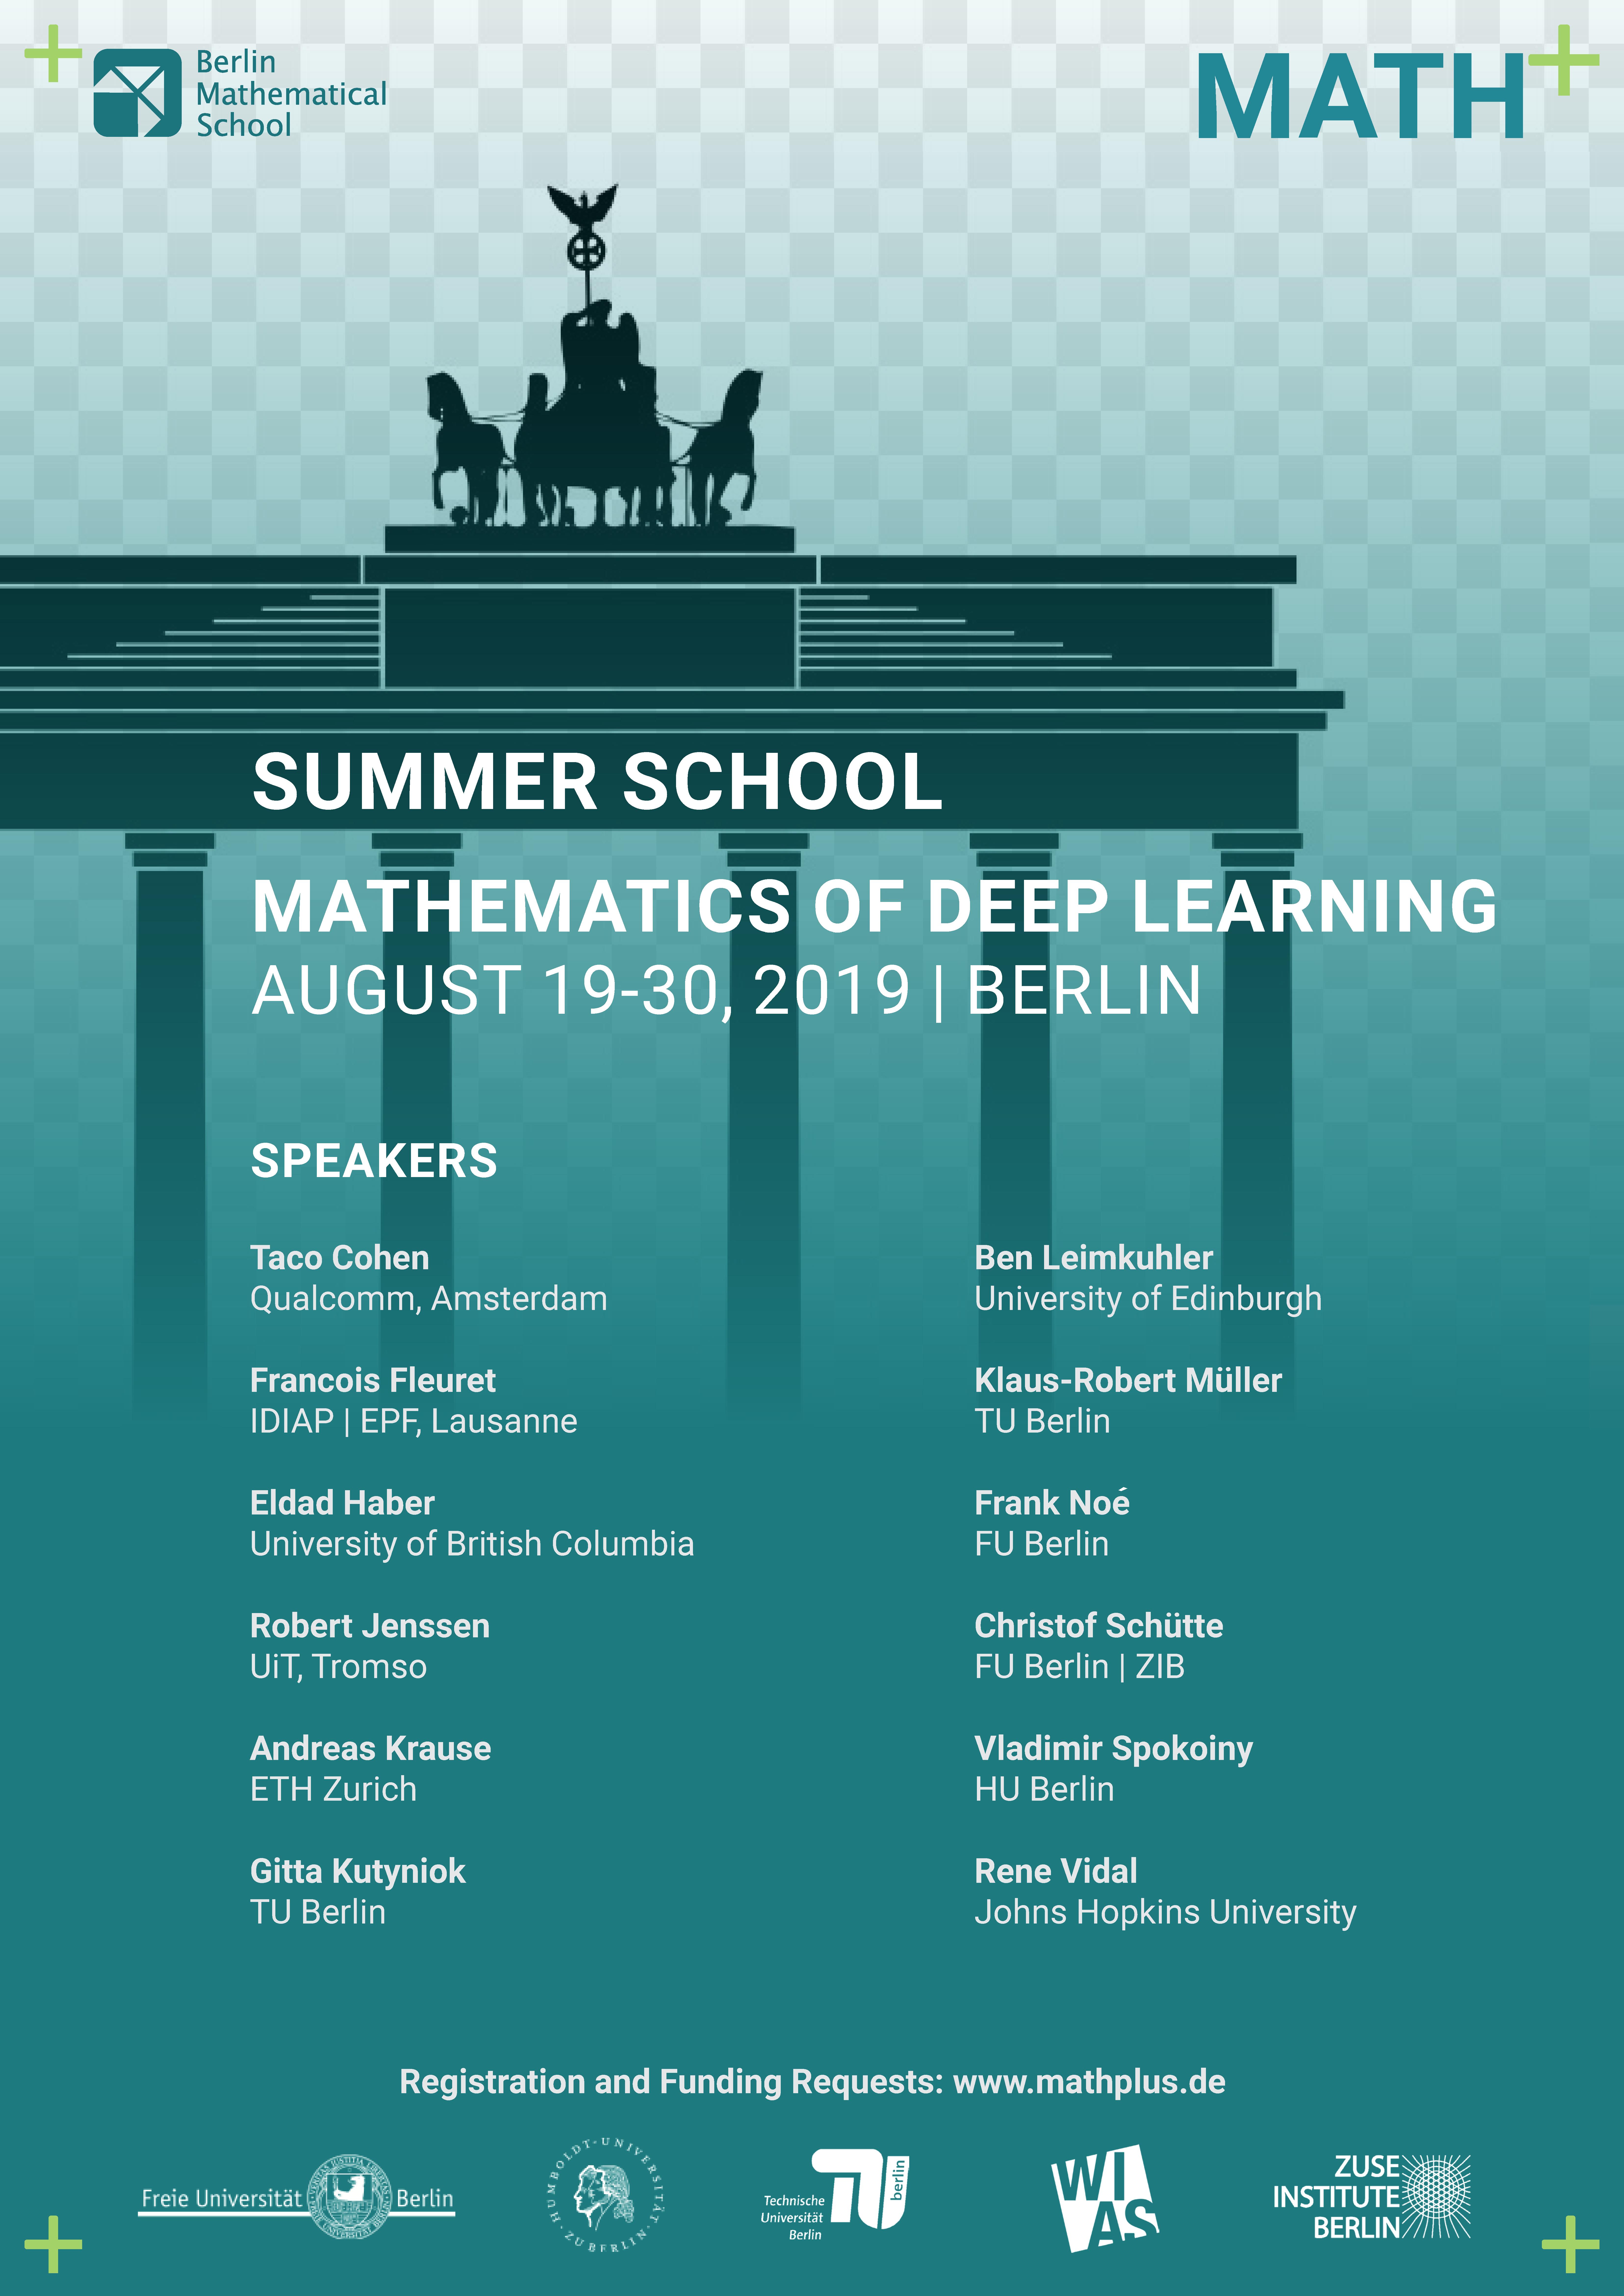 BMS Summer School 2019 Mathematics of Deep Learning